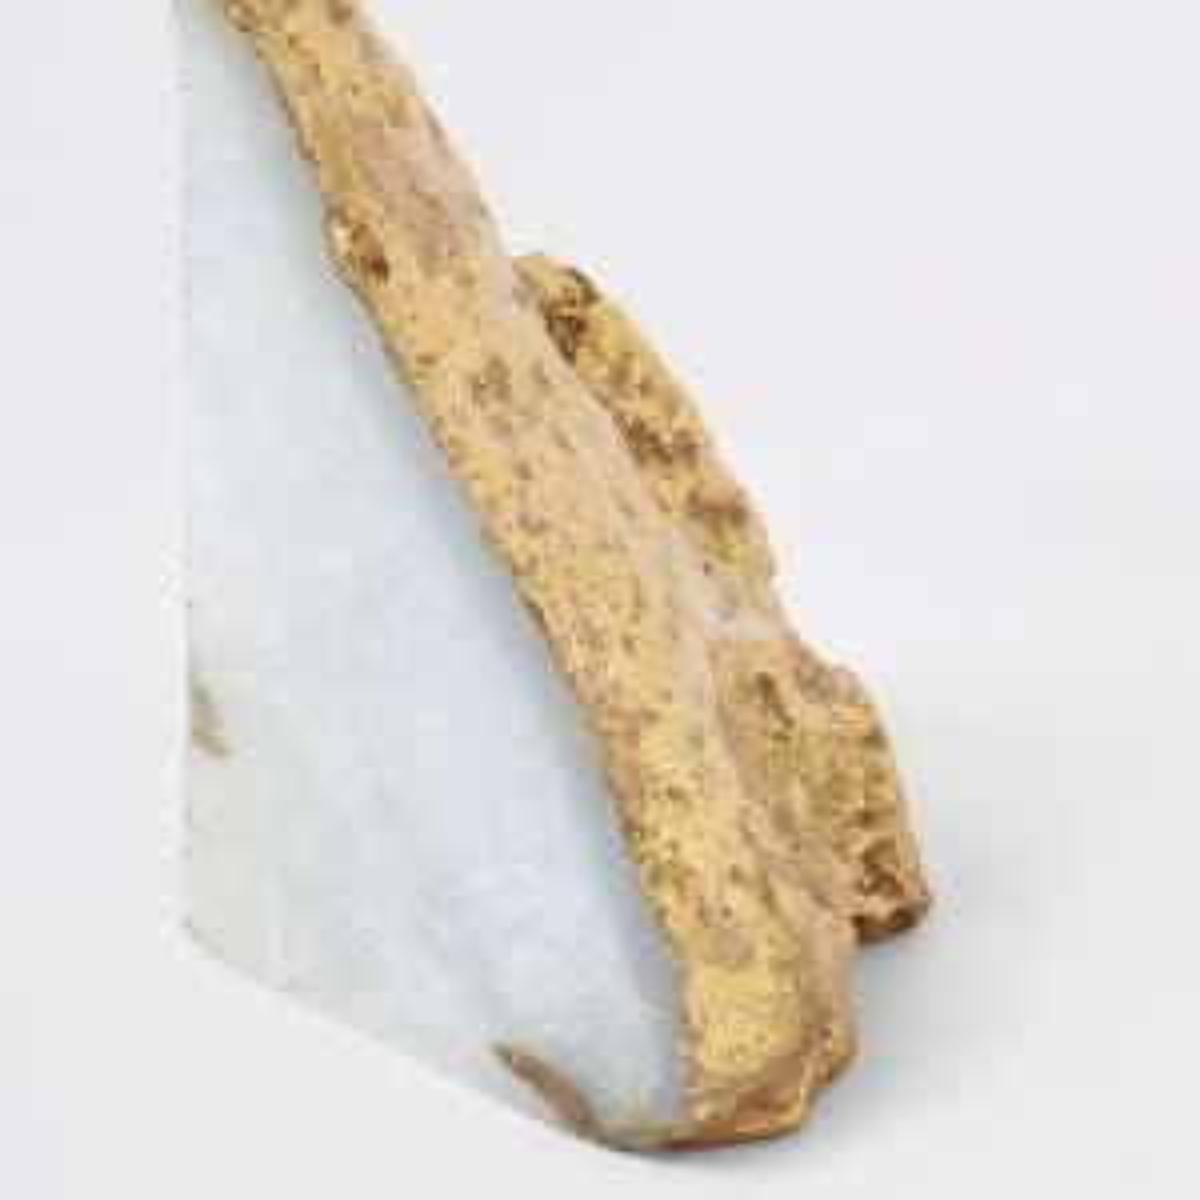 Natural agate gold book end £10 @ River Island (+ £3.99 del / £1 c&c)